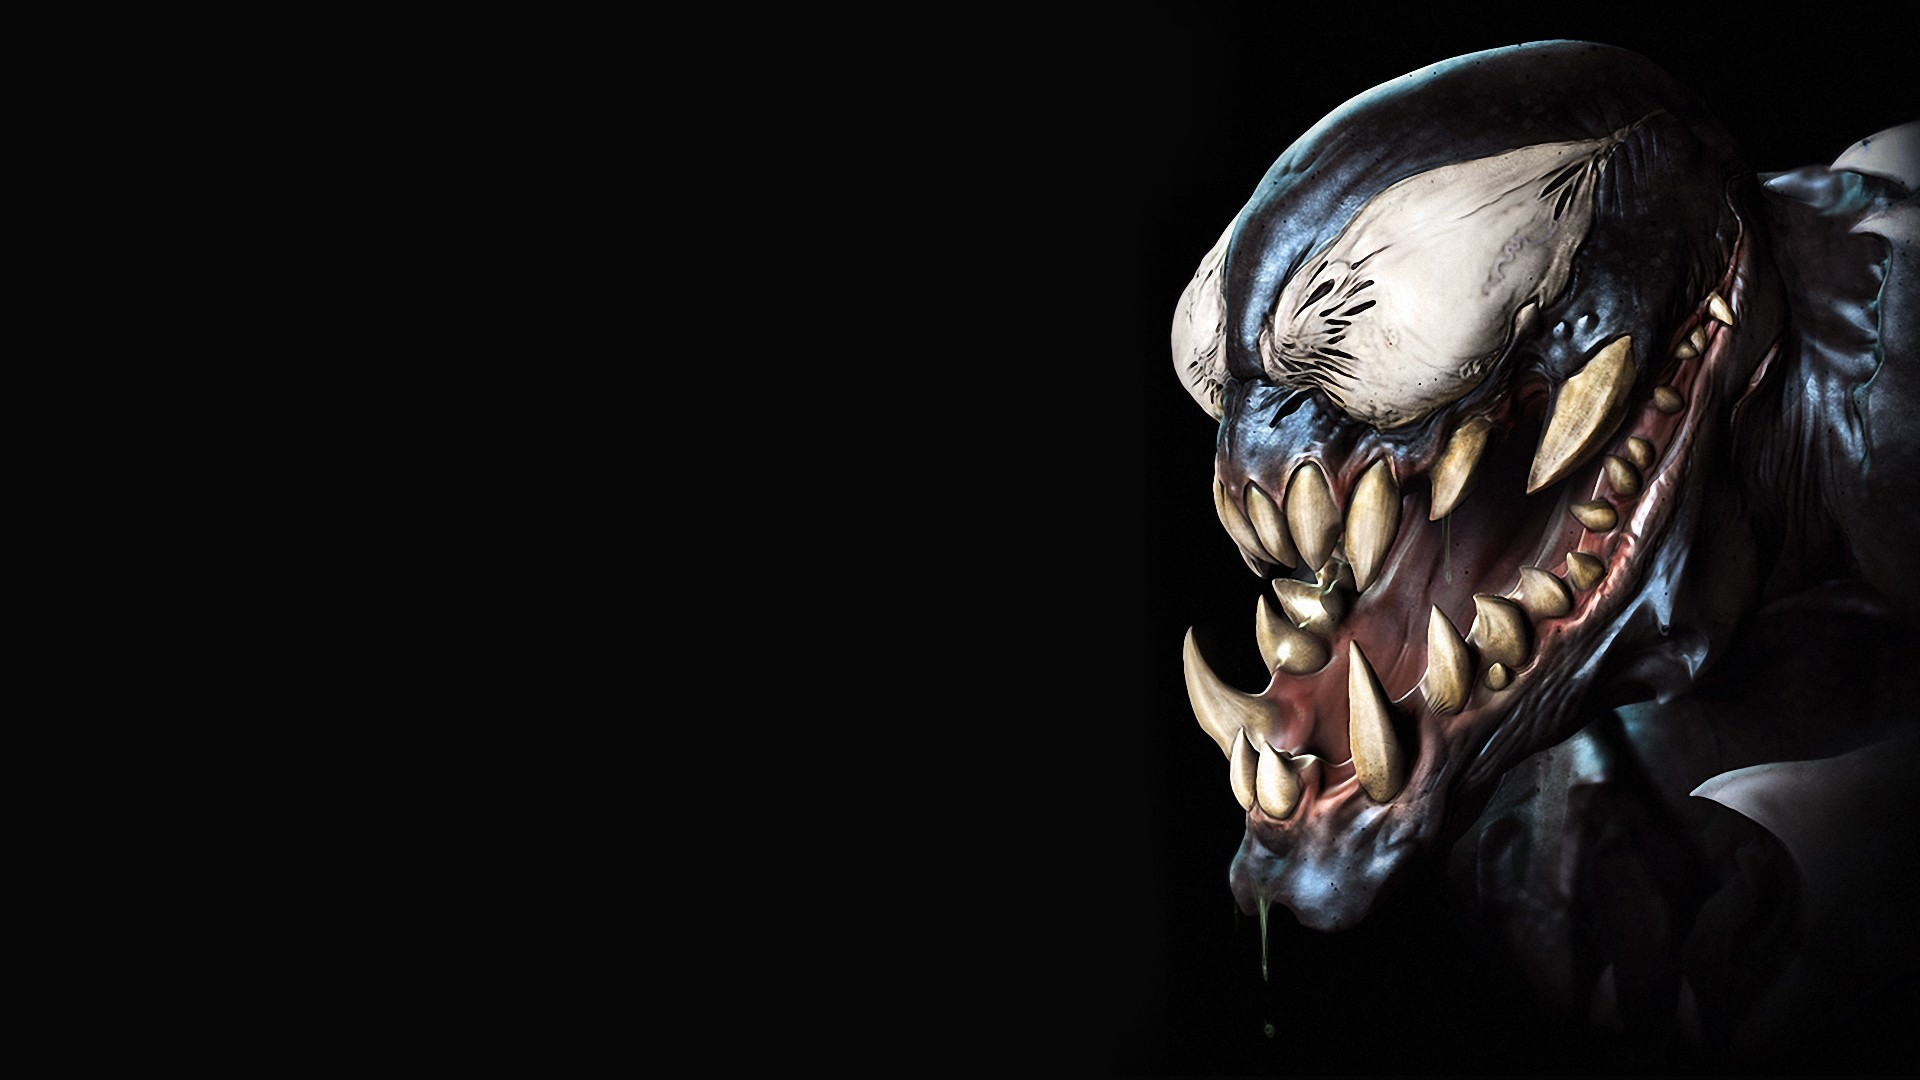 Spiderman Venom Wallpapers Wallpaper